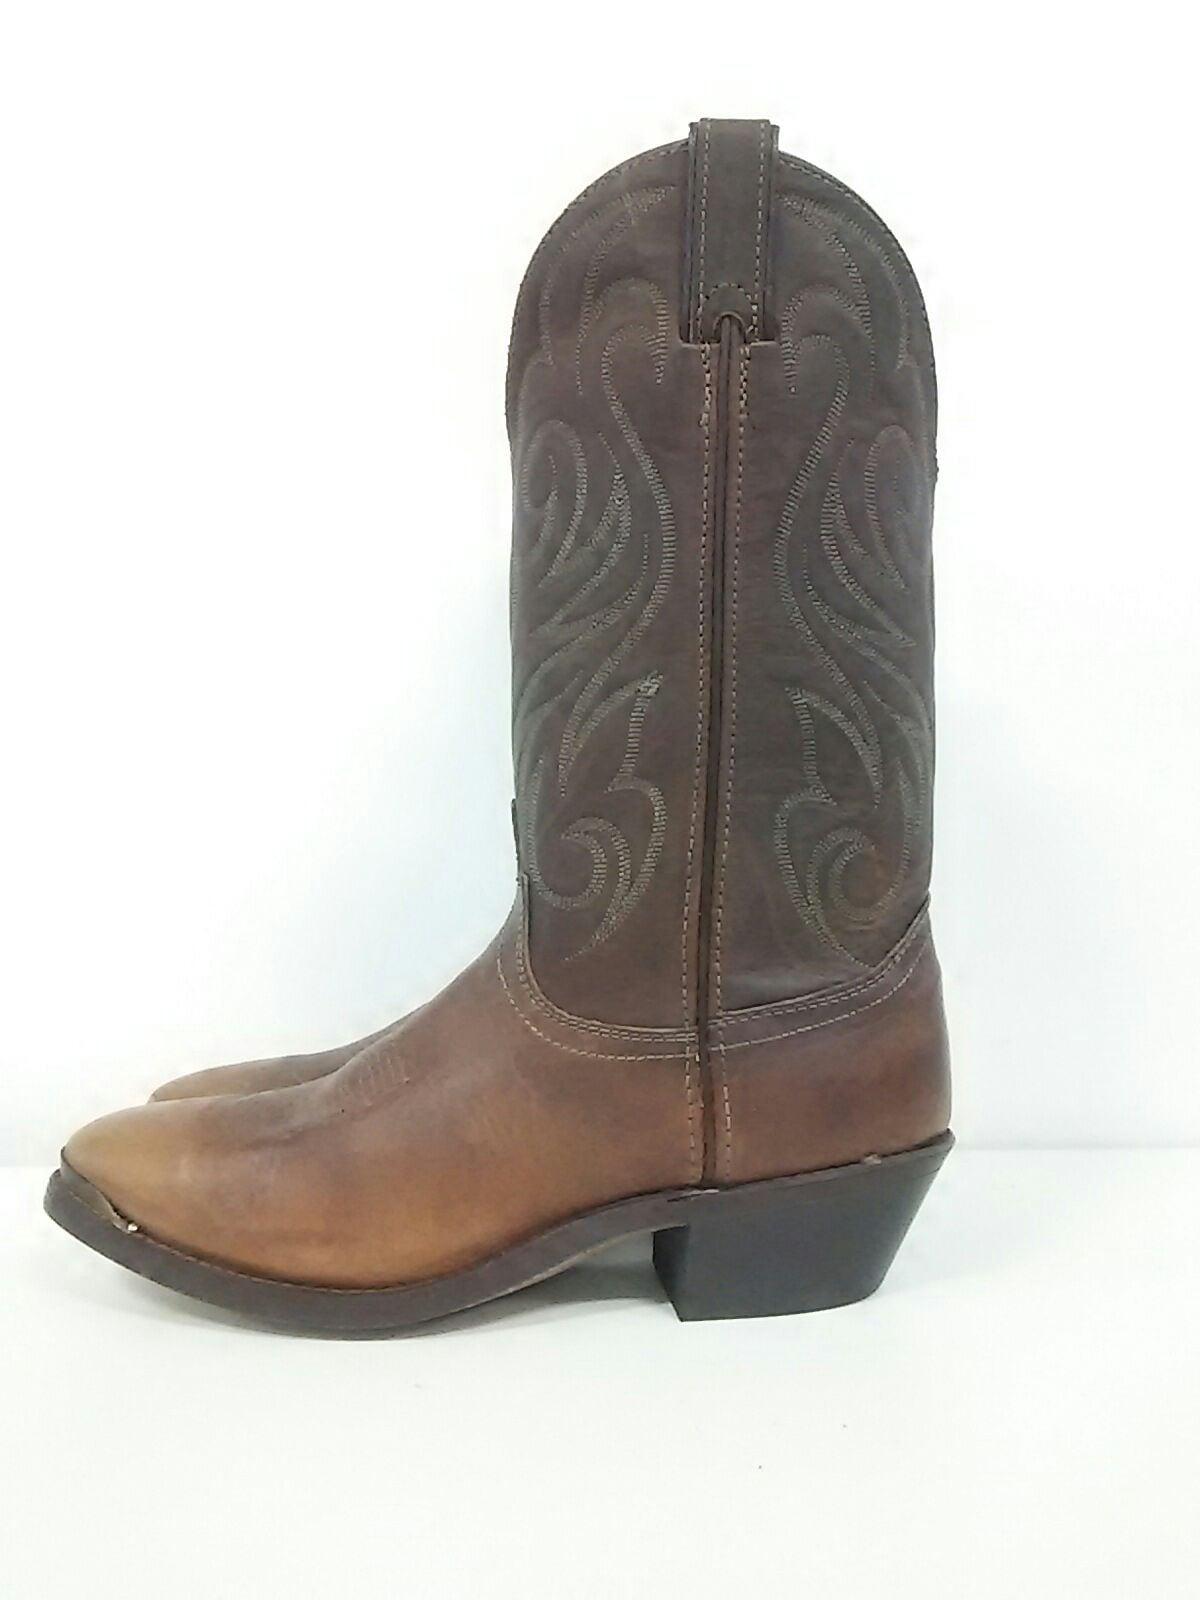 LAREDO(ラレド)のブーツ